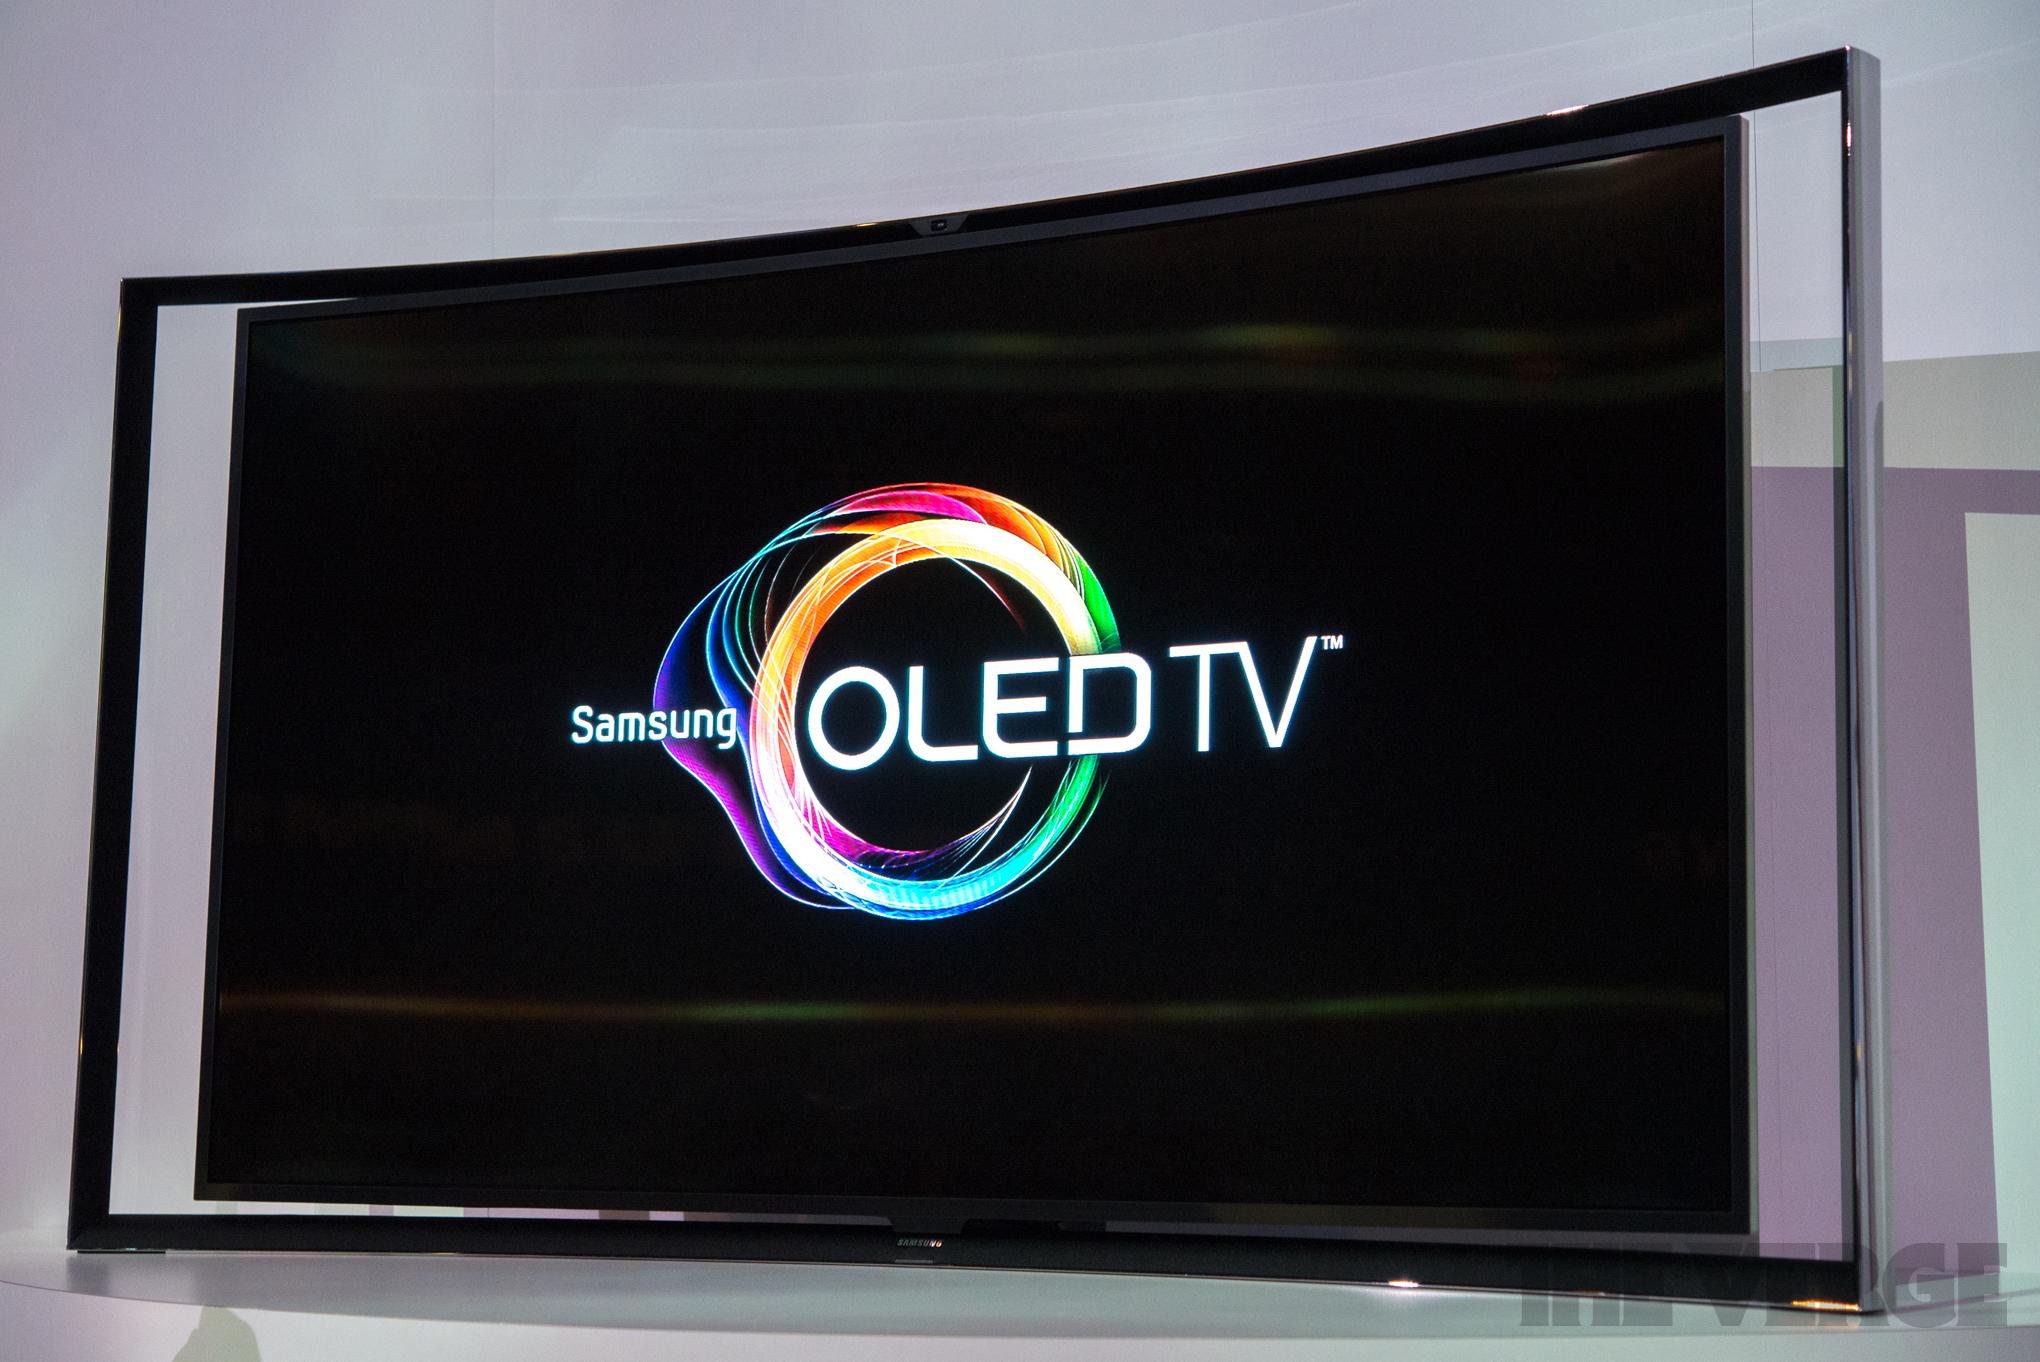 Samsung Curved OLED TV (hands on)